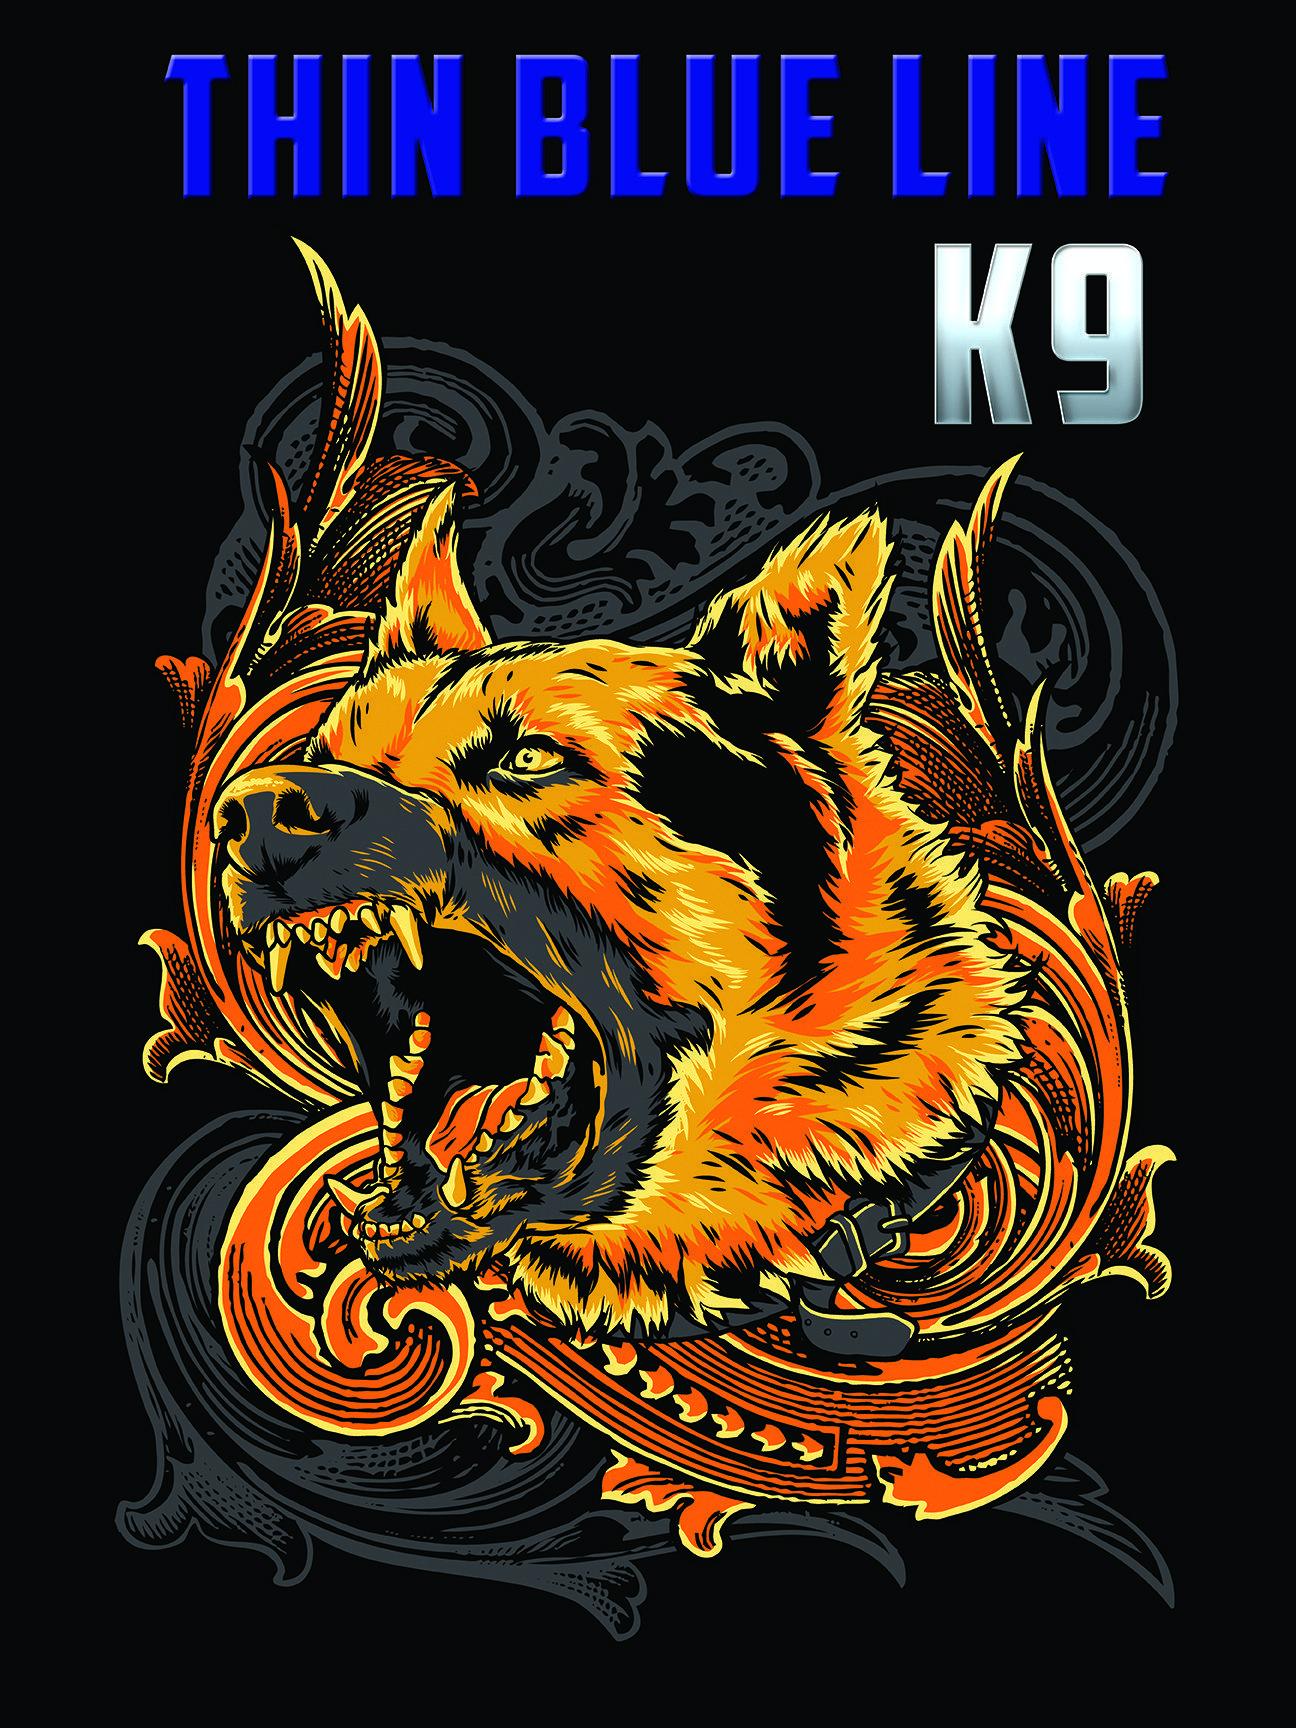 Thin Blue Line K9 Poster Police Life Police K9 Dog Logo